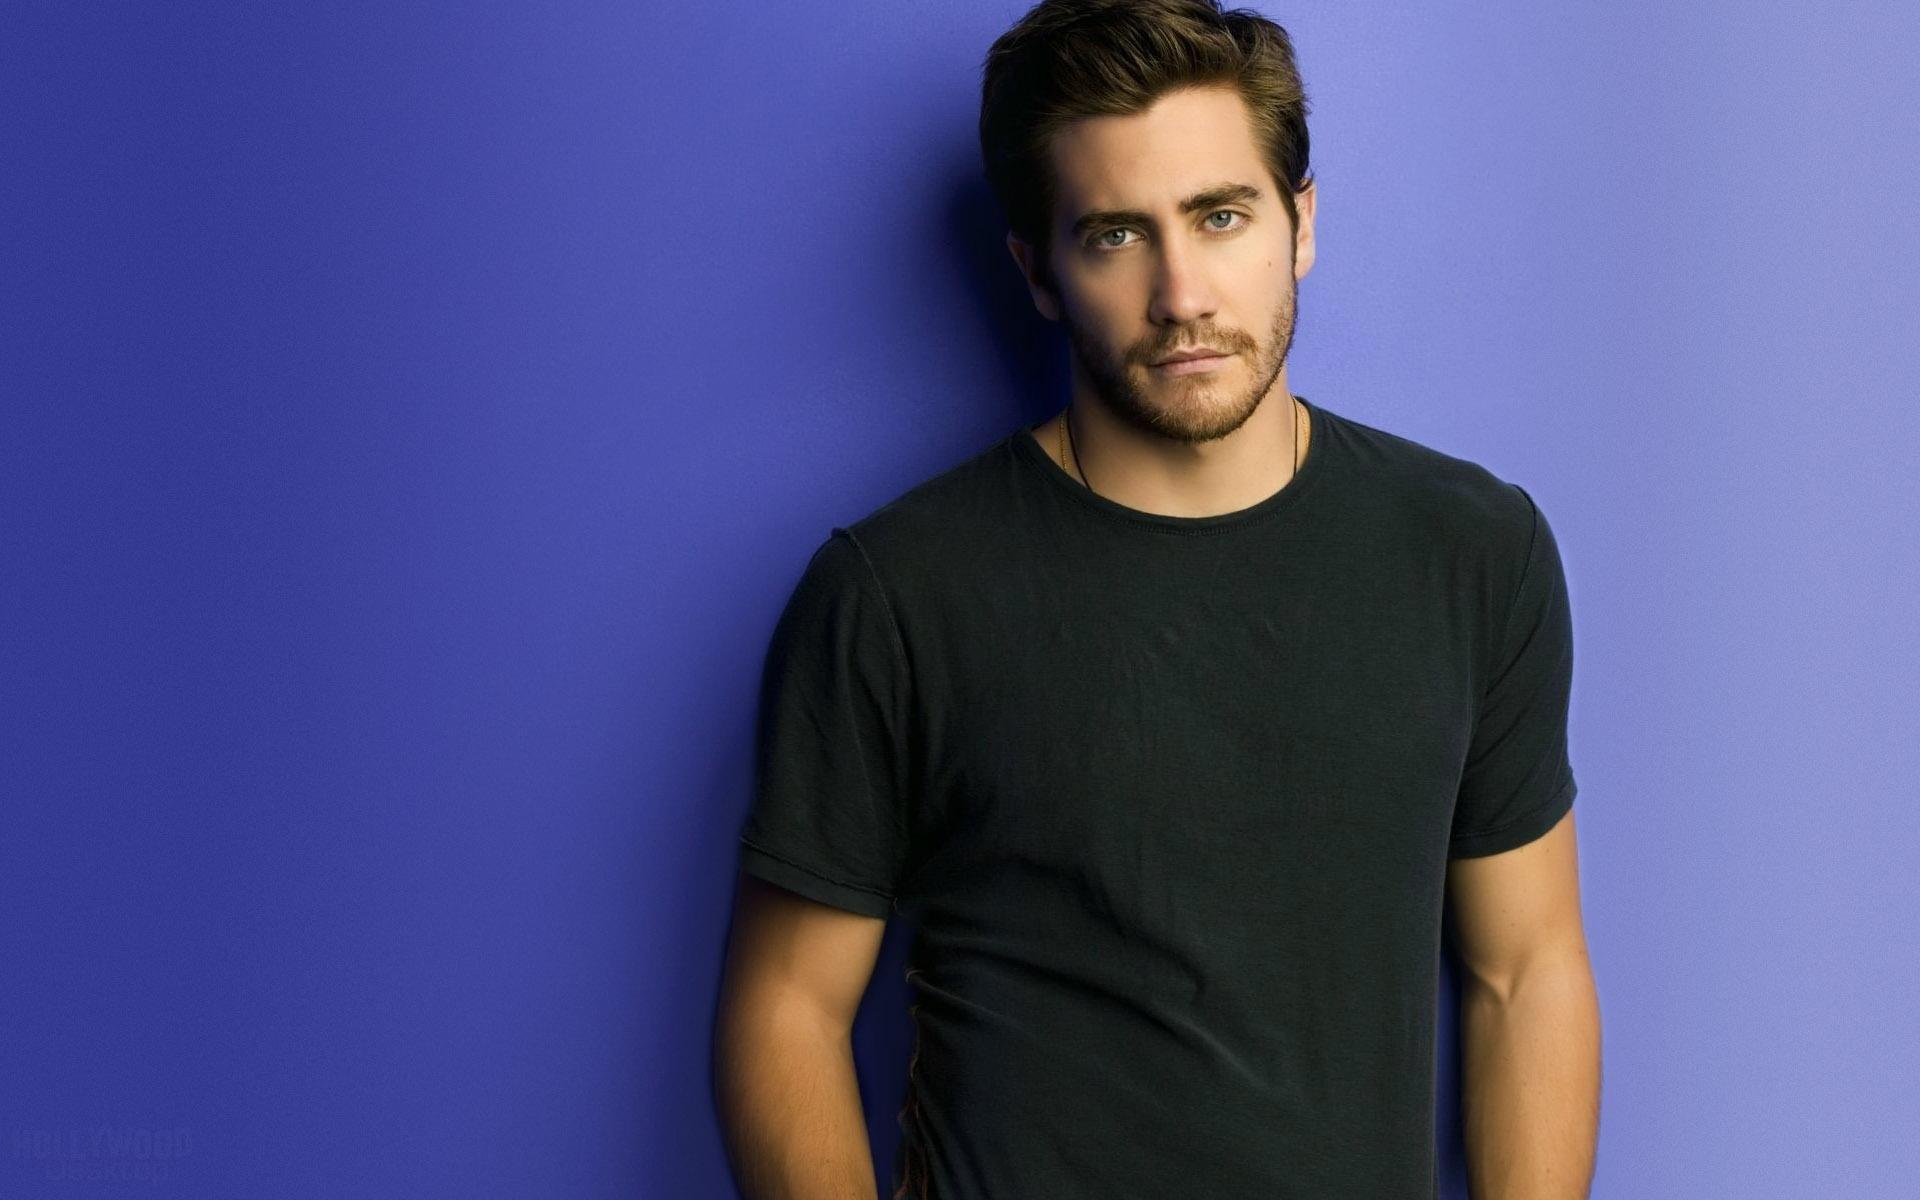 Free Jake Gyllenhaal Wallpaper